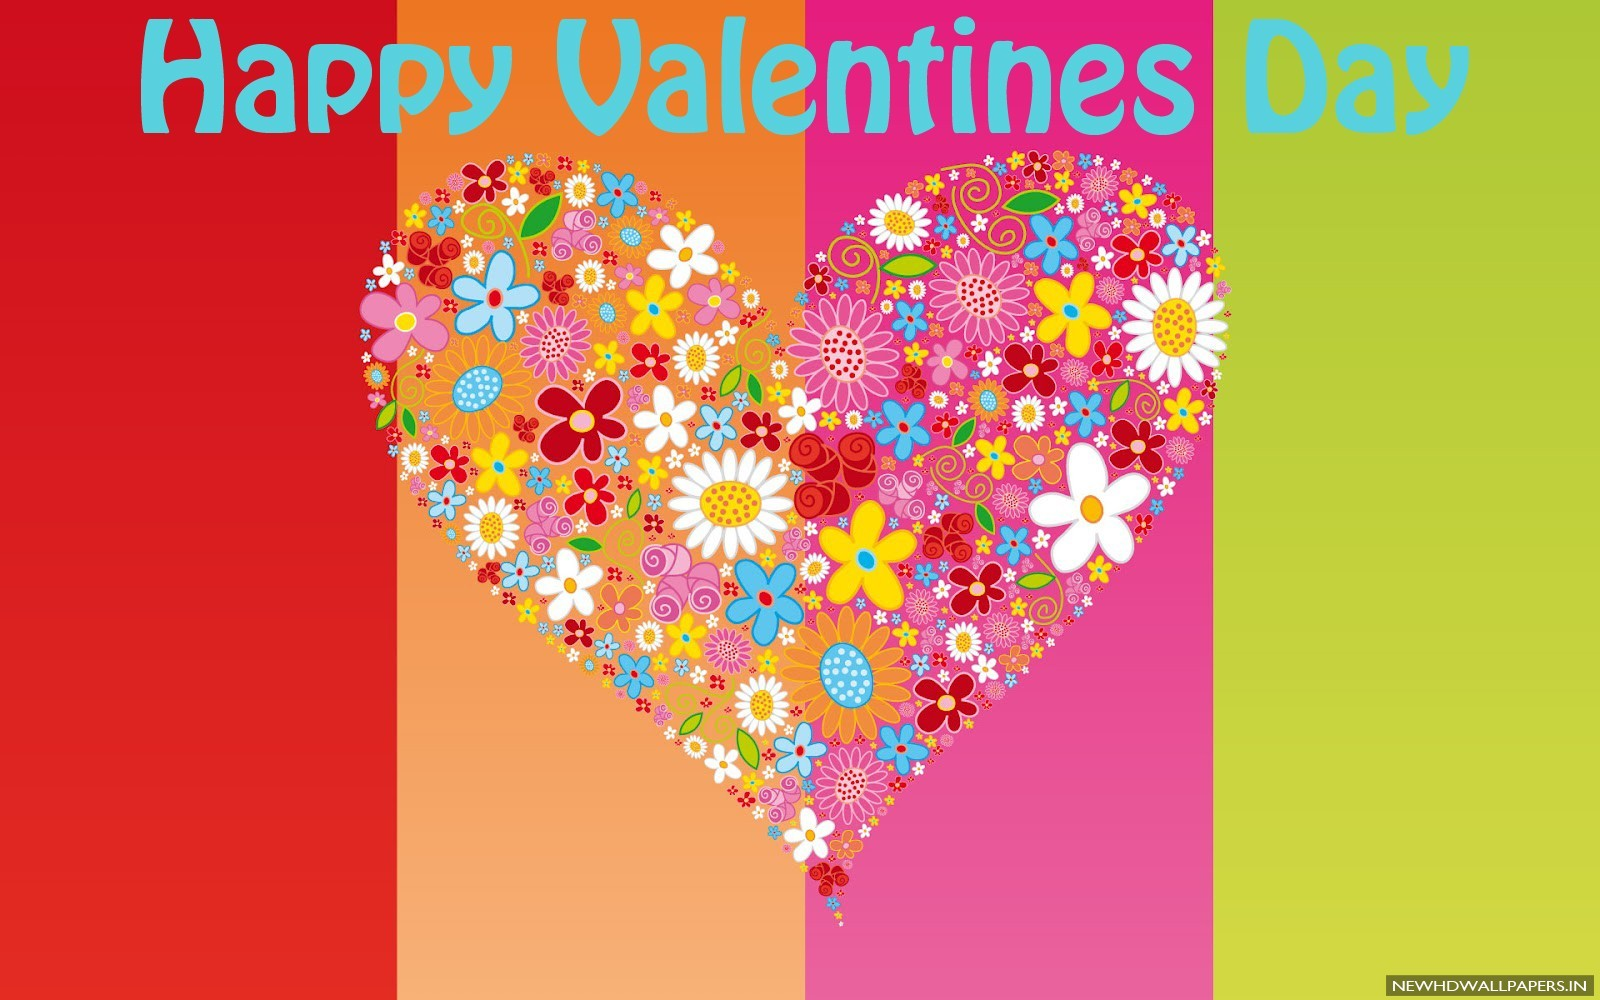 Happy Valentines Day cute Wallpaper hd